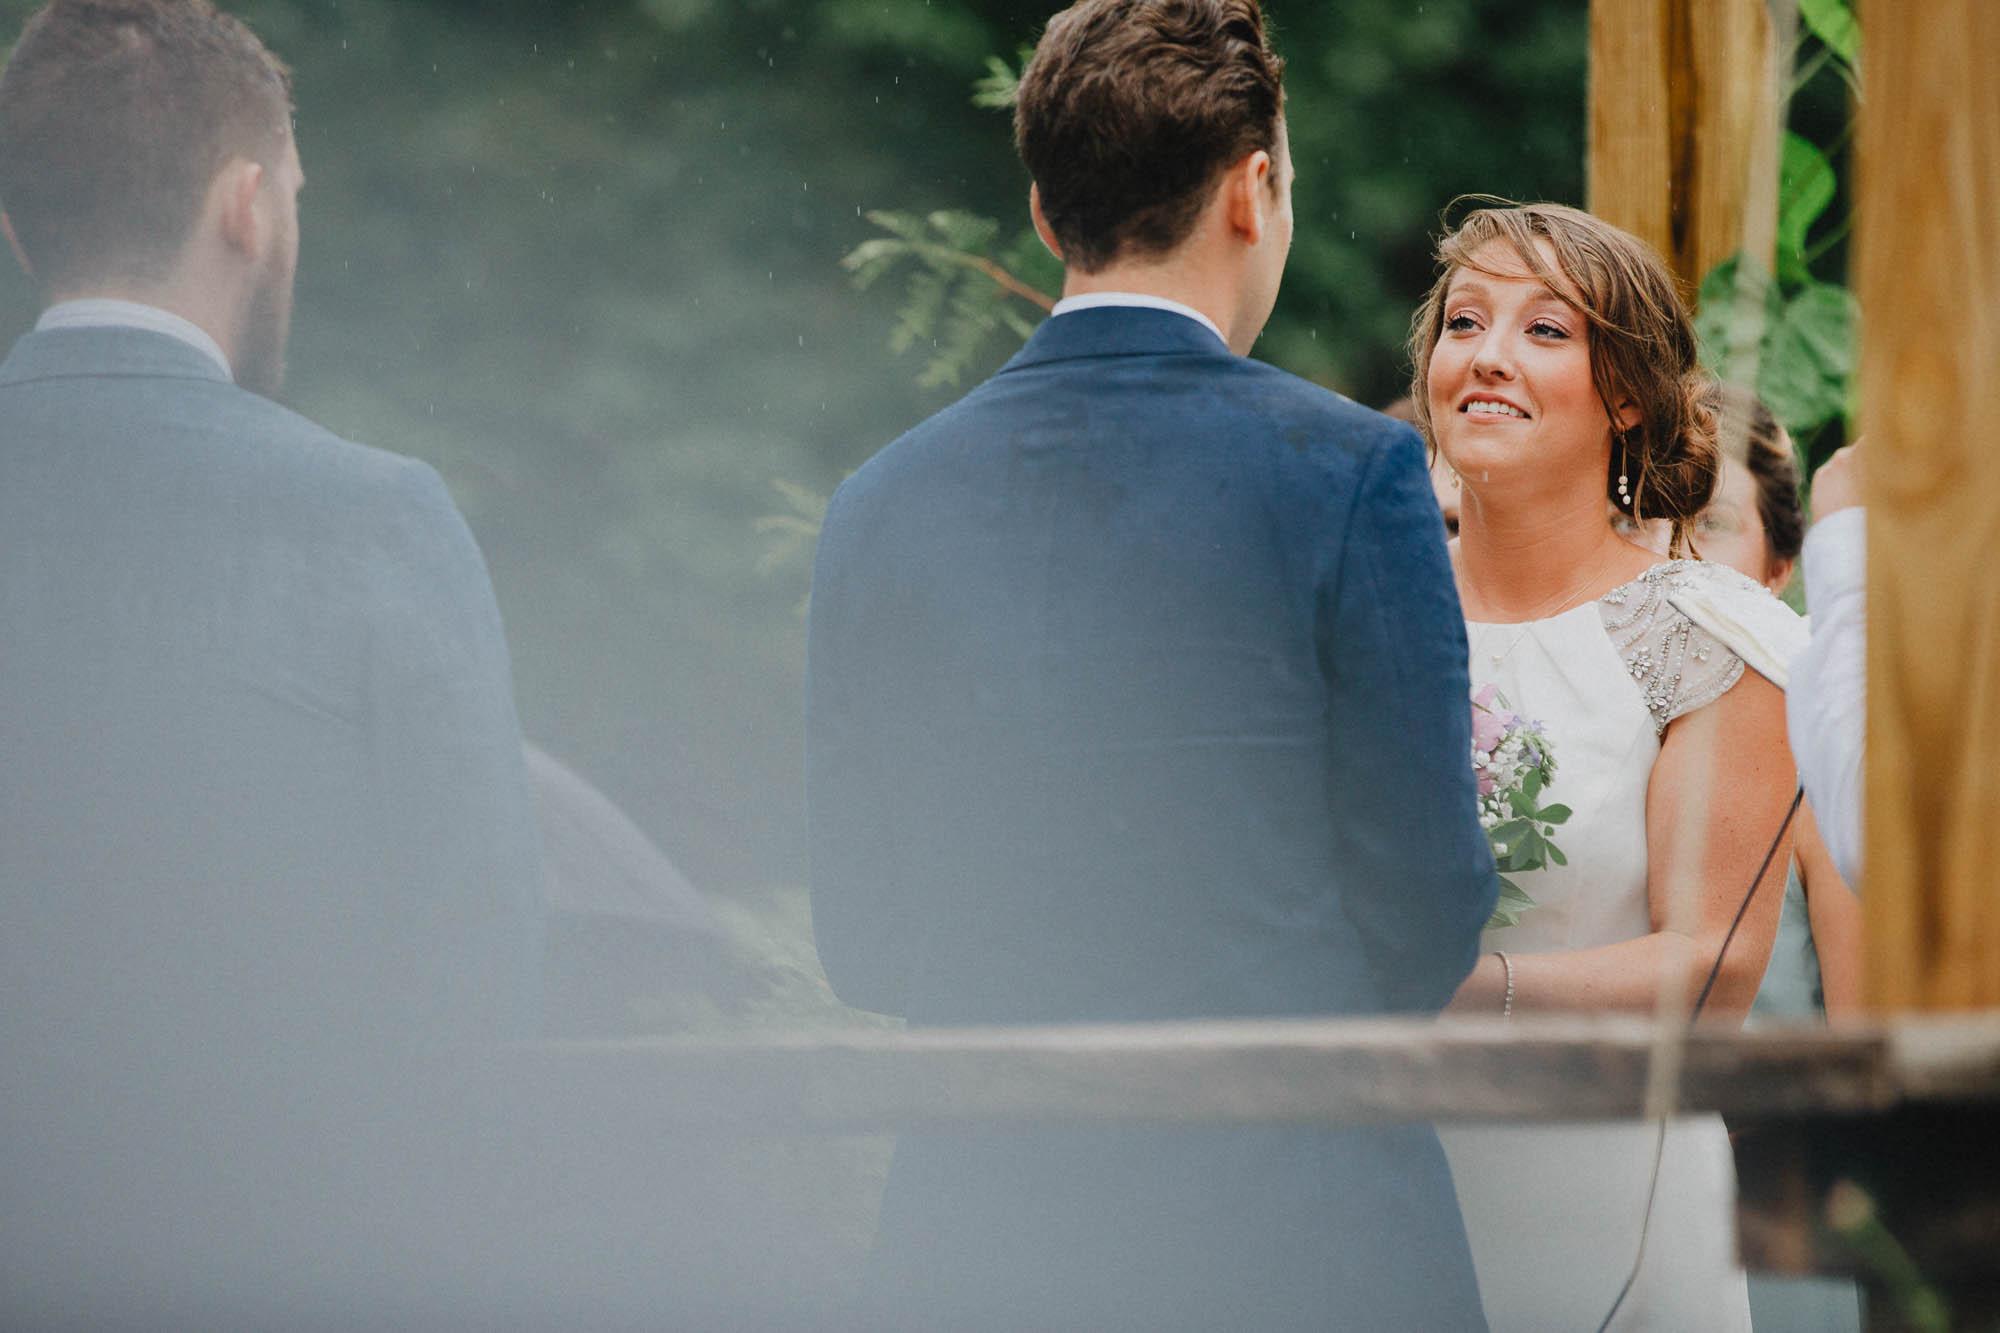 Leah-Graham-Michigan-Outdoor-DIY-Wedding-050@2x.jpg